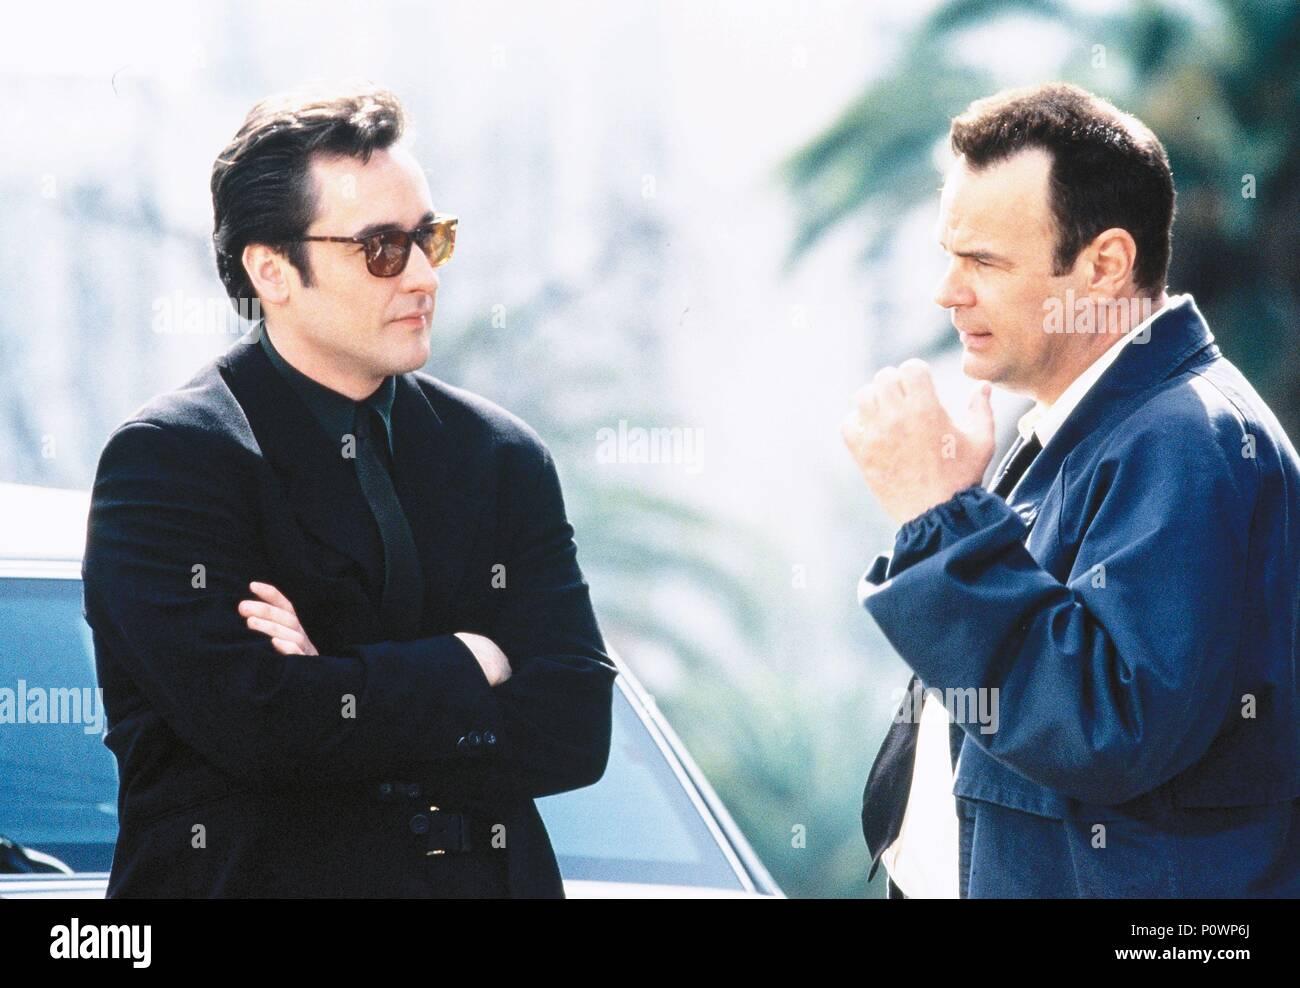 Original Film Title: GROSSE POINTE BLANK.  English Title: GROSSE POINTE BLANK.  Film Director: GEORGE ARMITAGE.  Year: 1997.  Stars: DAN AYKROYD; JOHN CUSACK. Credit: HOLLYWOOD PICTURES / GORDON, MELINDA SUE / Album - Stock Image